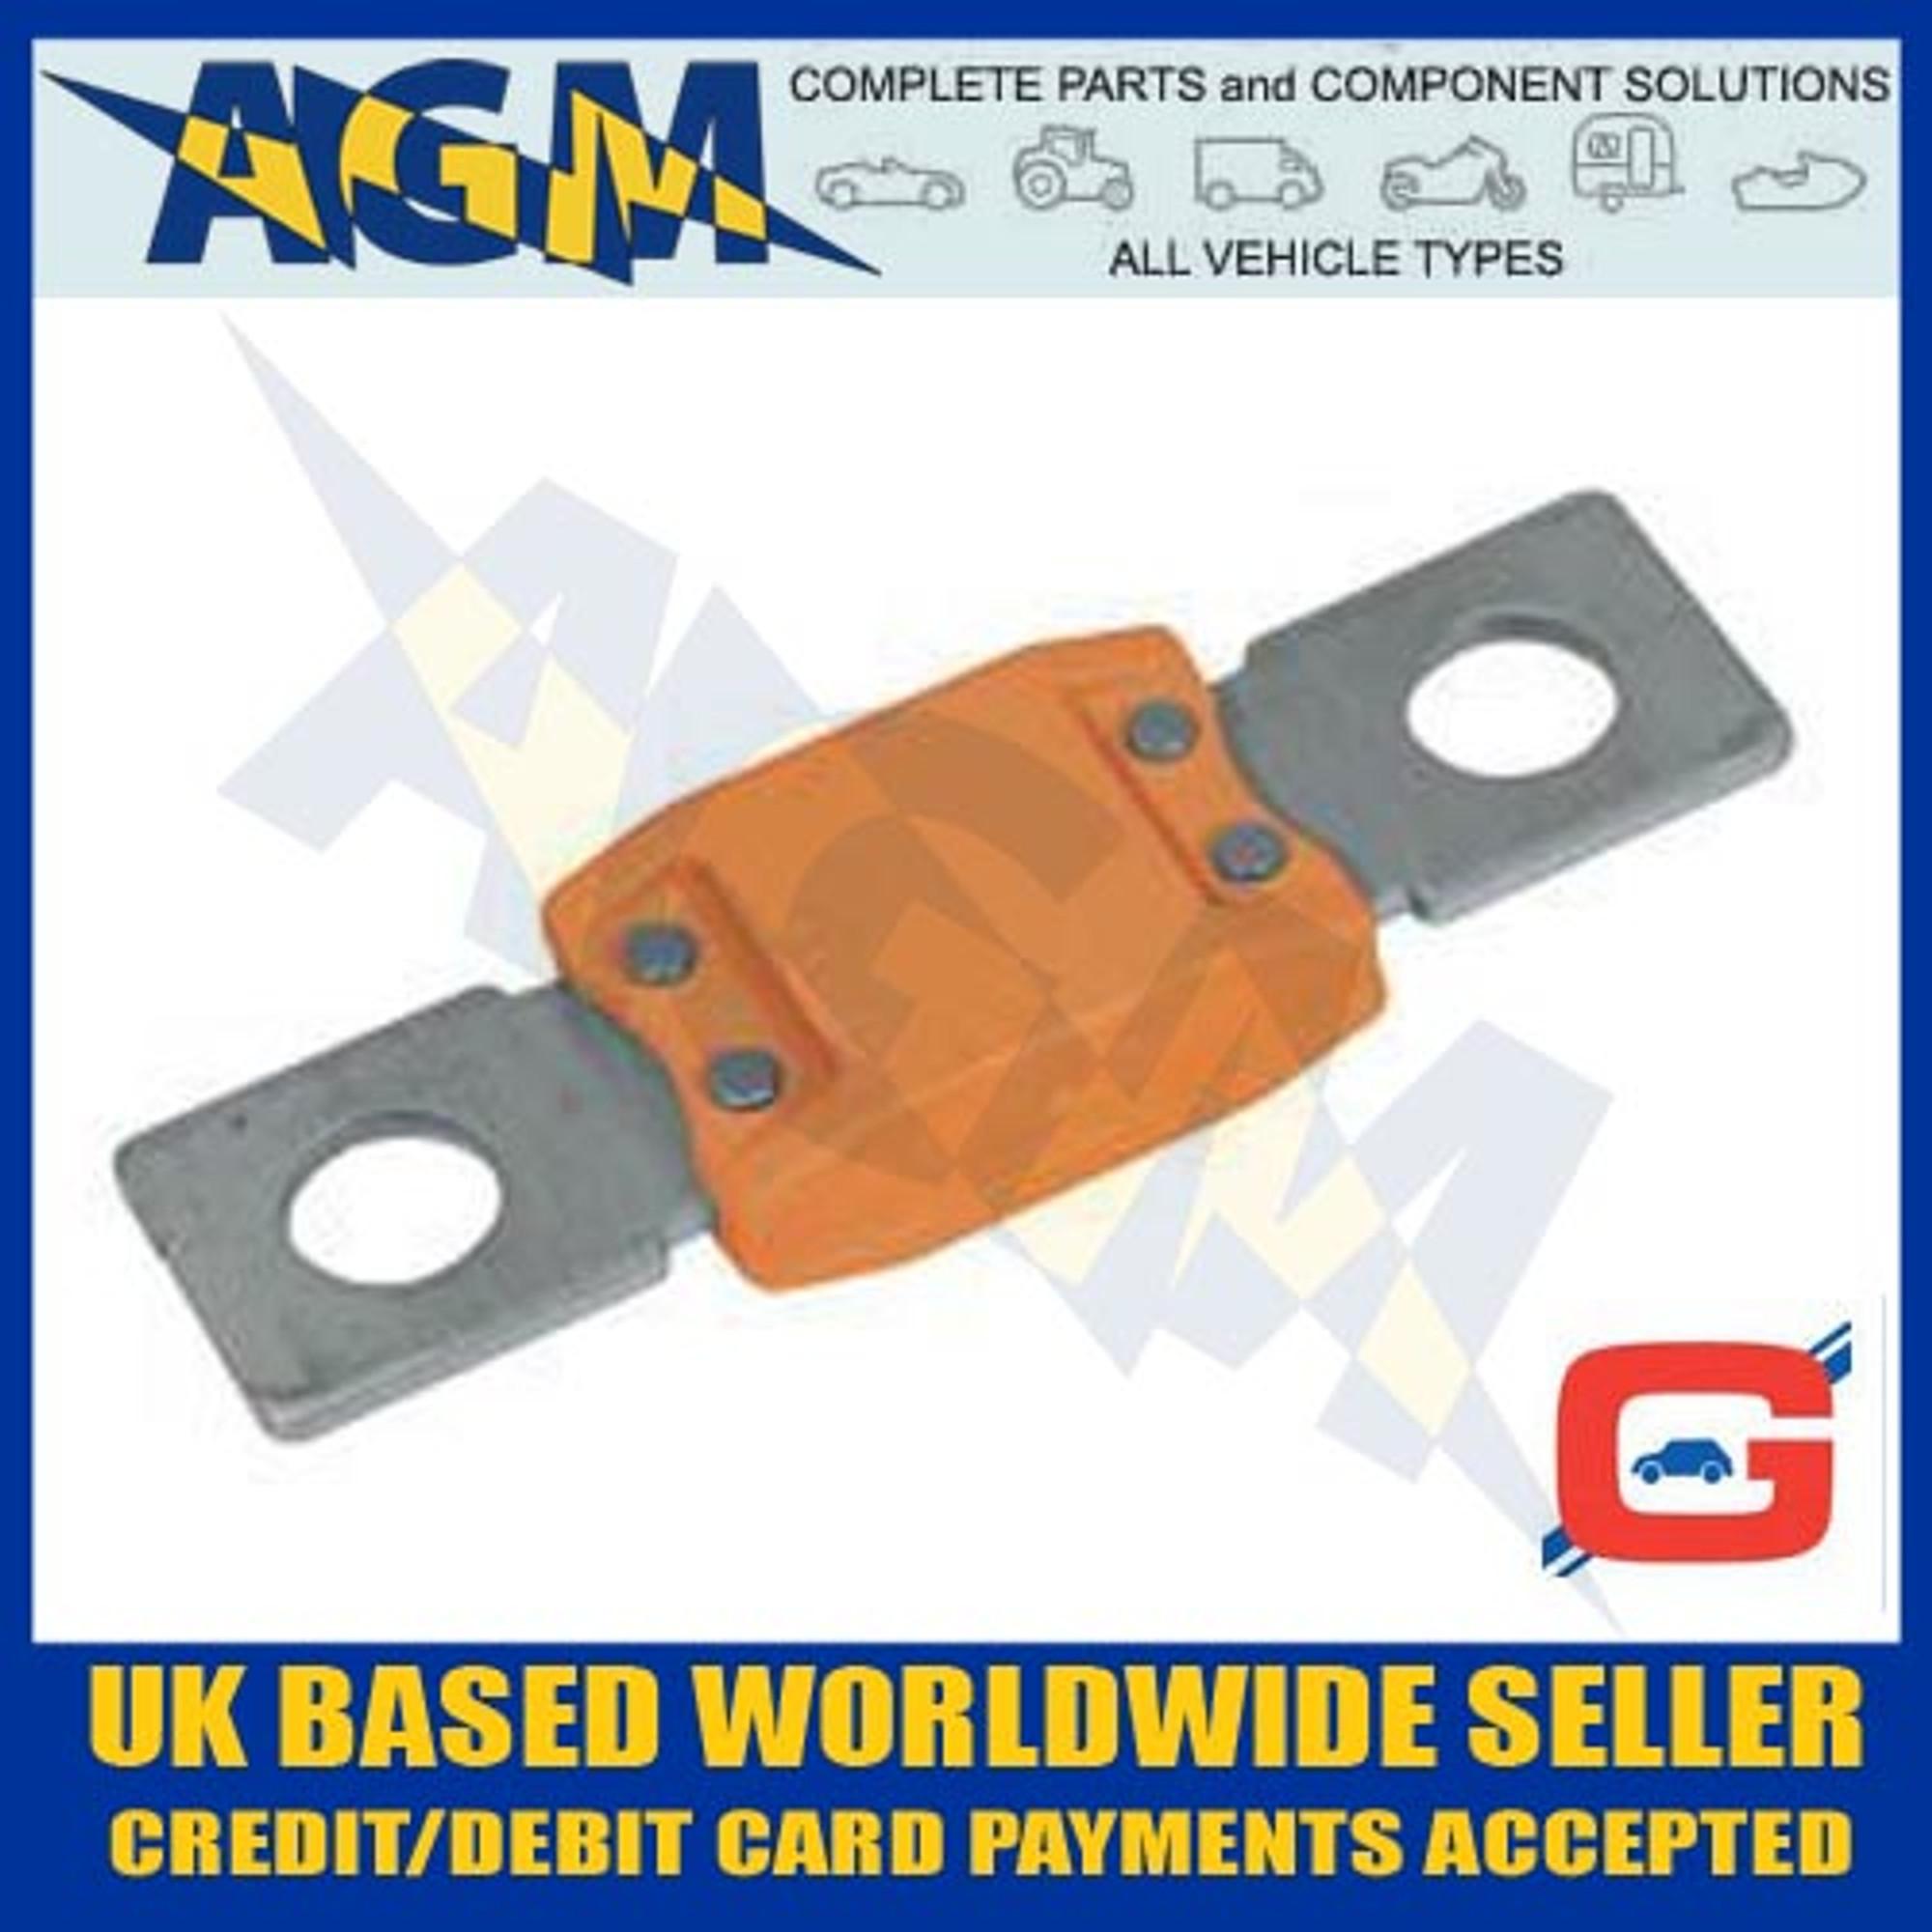 New Guardian Automotive Mega Fuse Pt Number Mega150 150 Amp Rating Orangeagm L